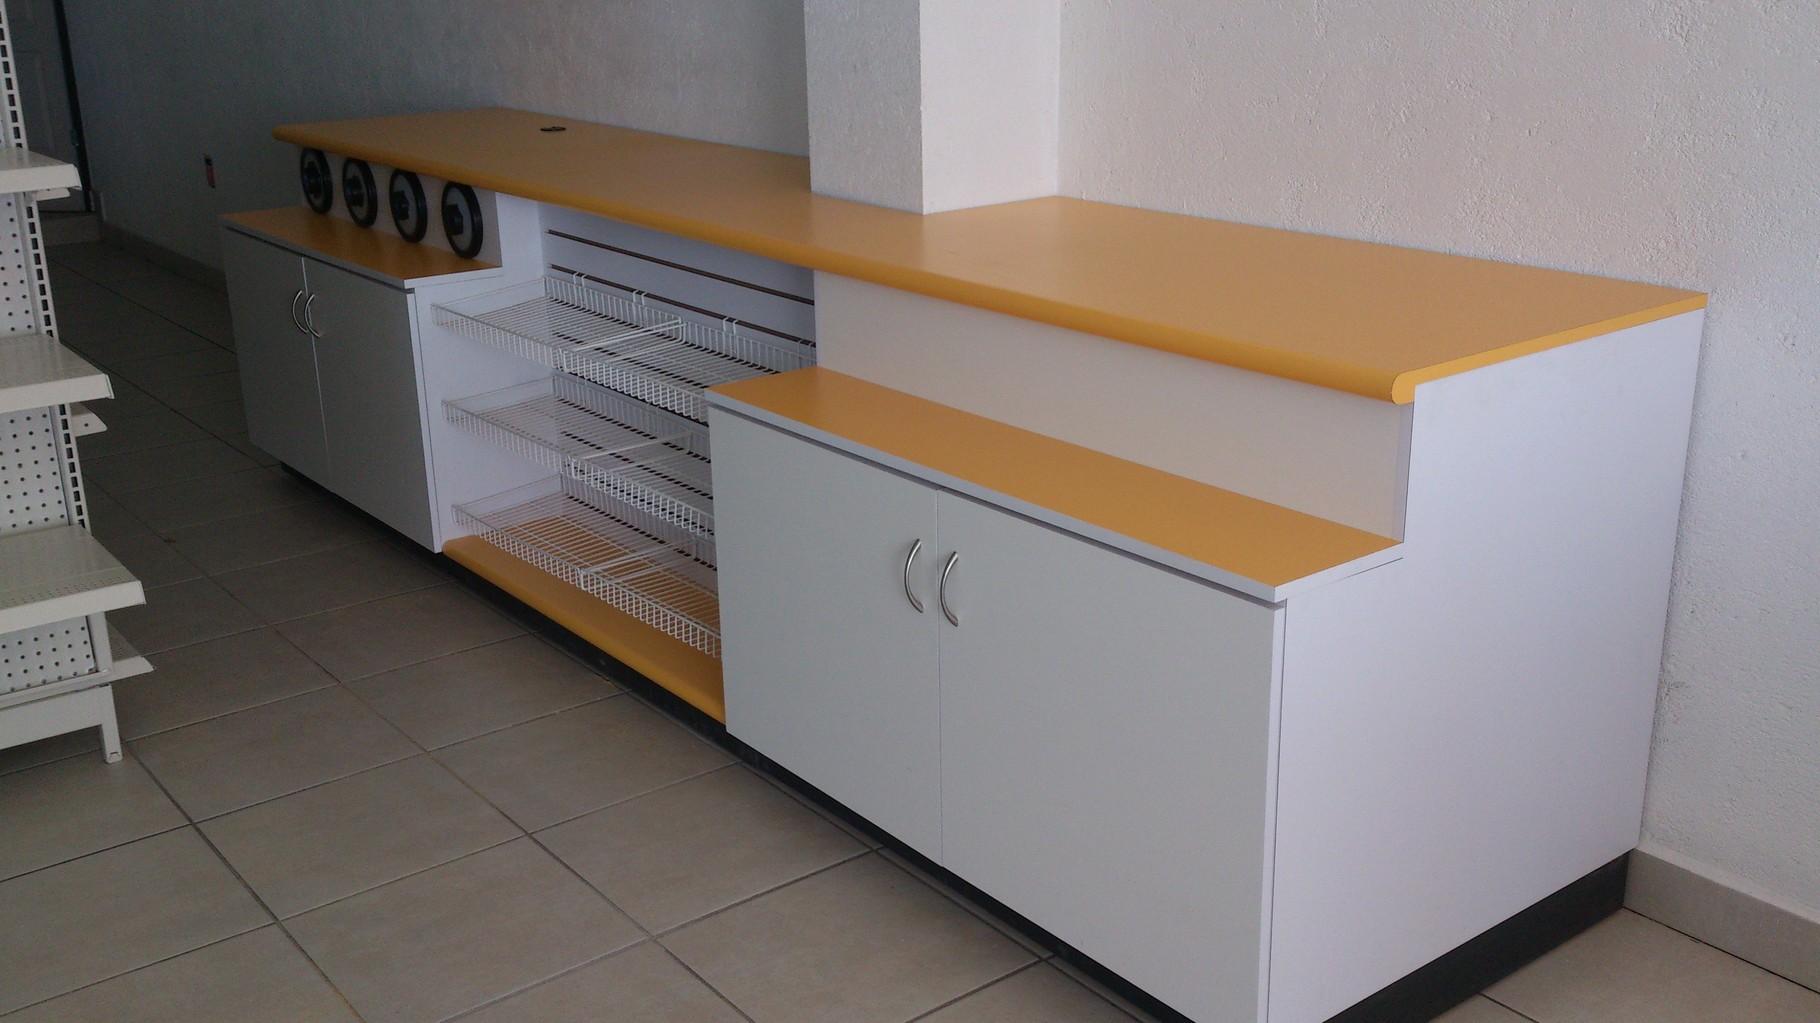 Muebles tipo oxxo vitrinas mostradores estantes for Muebles para negocio